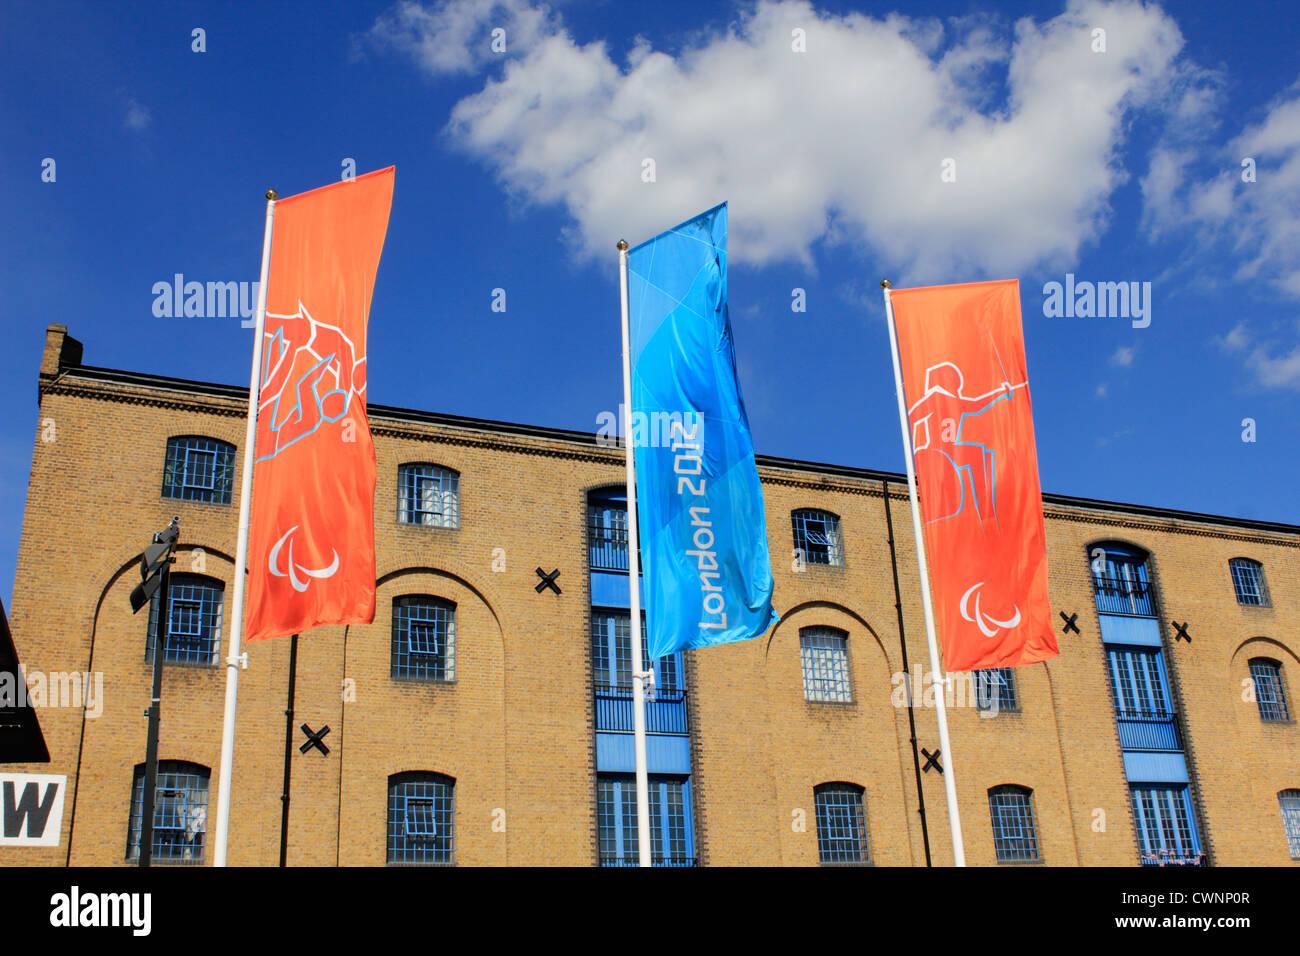 Excel Centre Stock Photos & Excel Centre Stock Images - Alamy